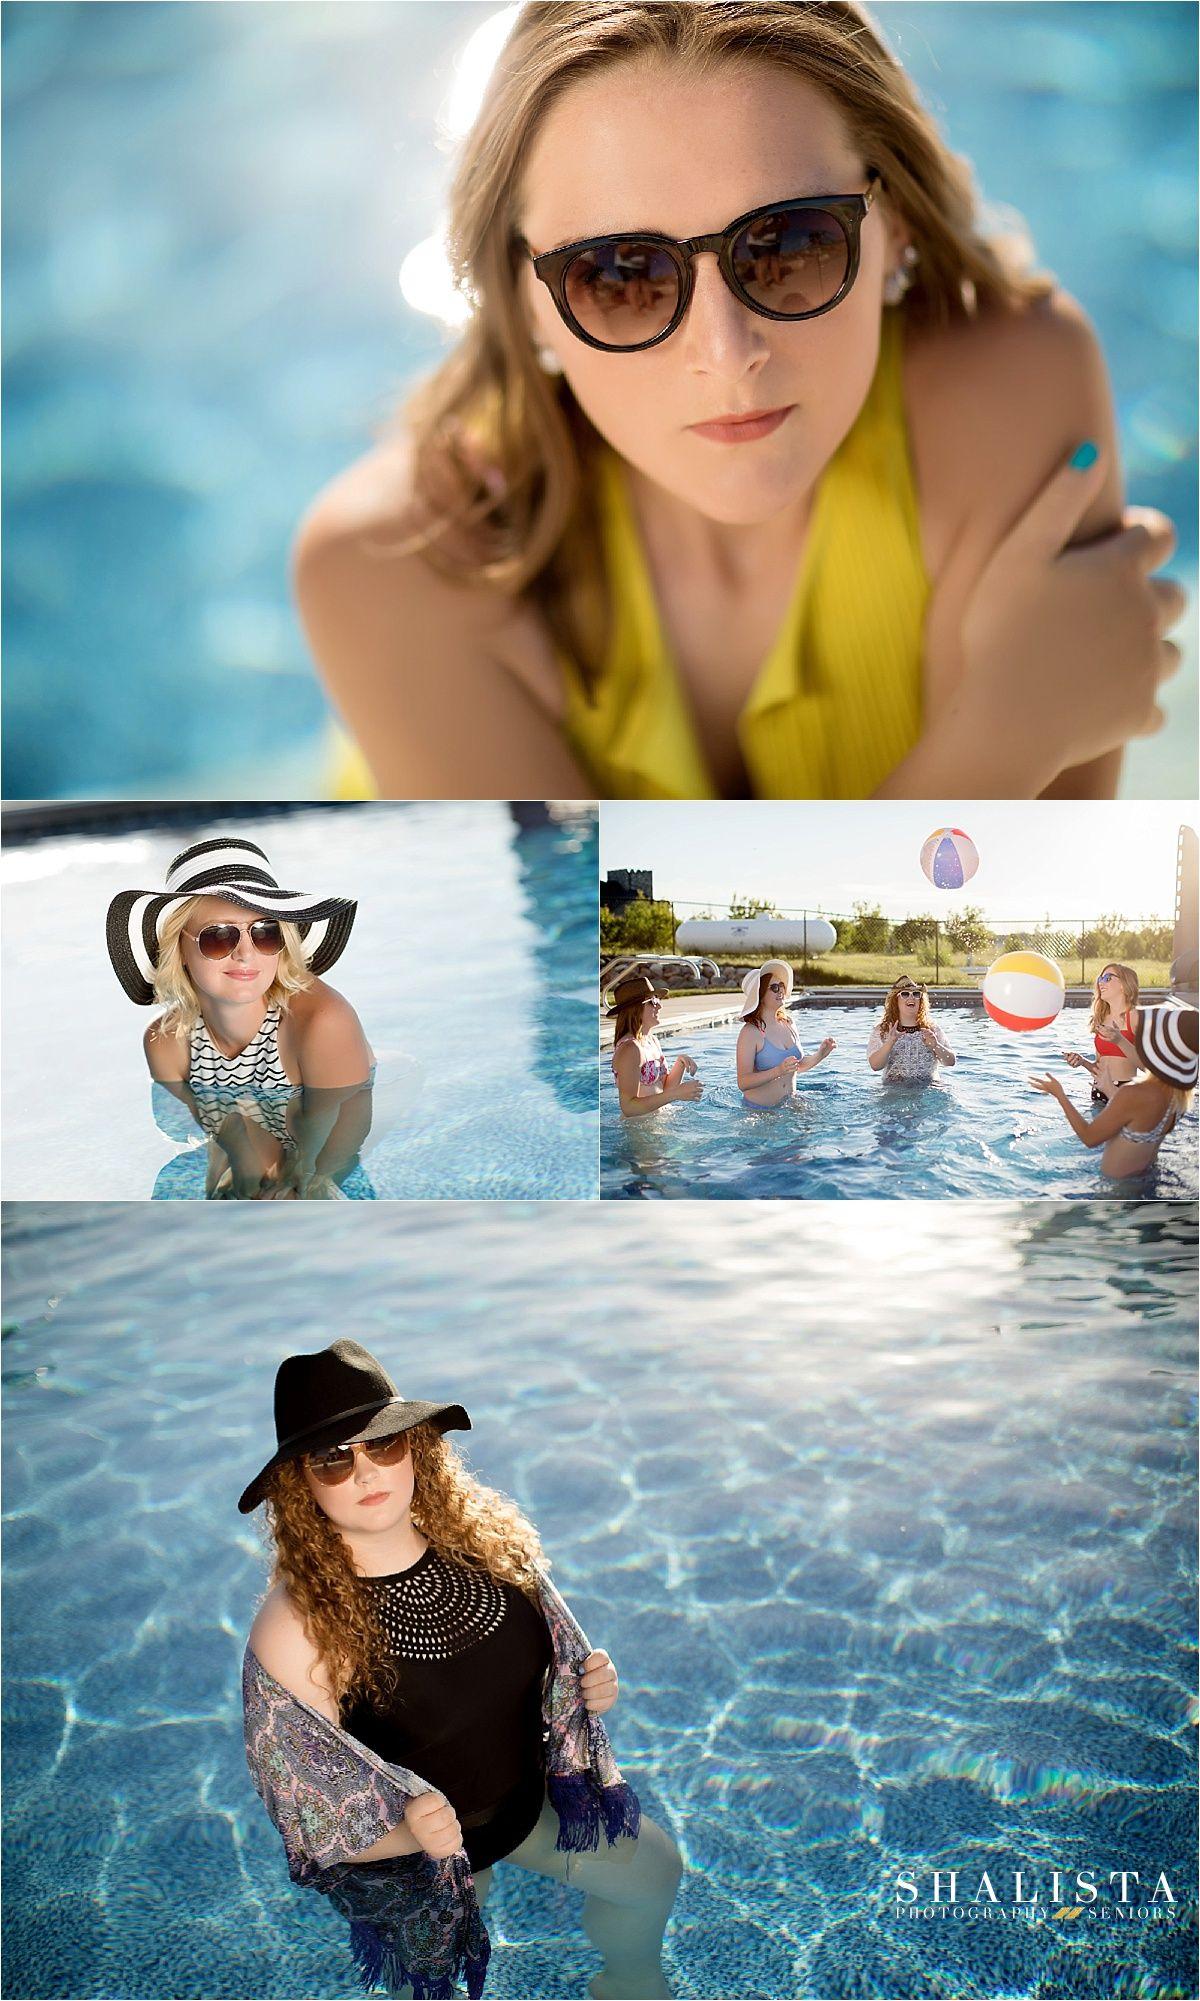 Senior Models Summer Pool Photoshoot! Pool photography